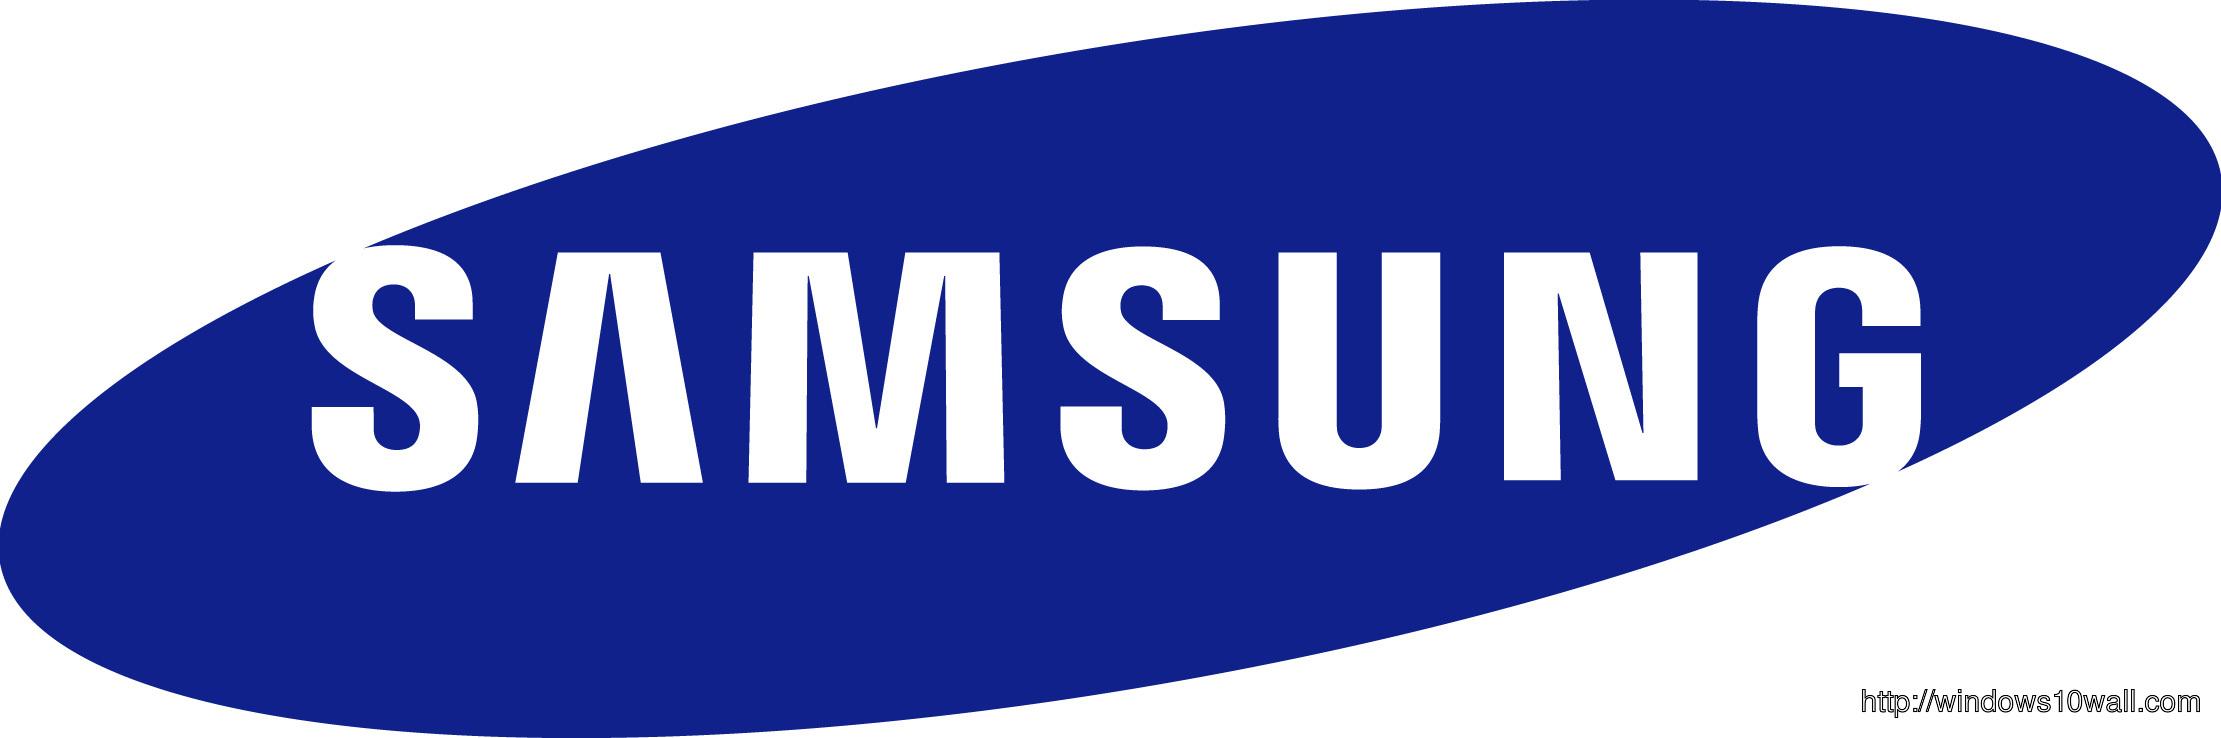 Samsung Logo Background Wallpaper Windows 10 Wallpapers